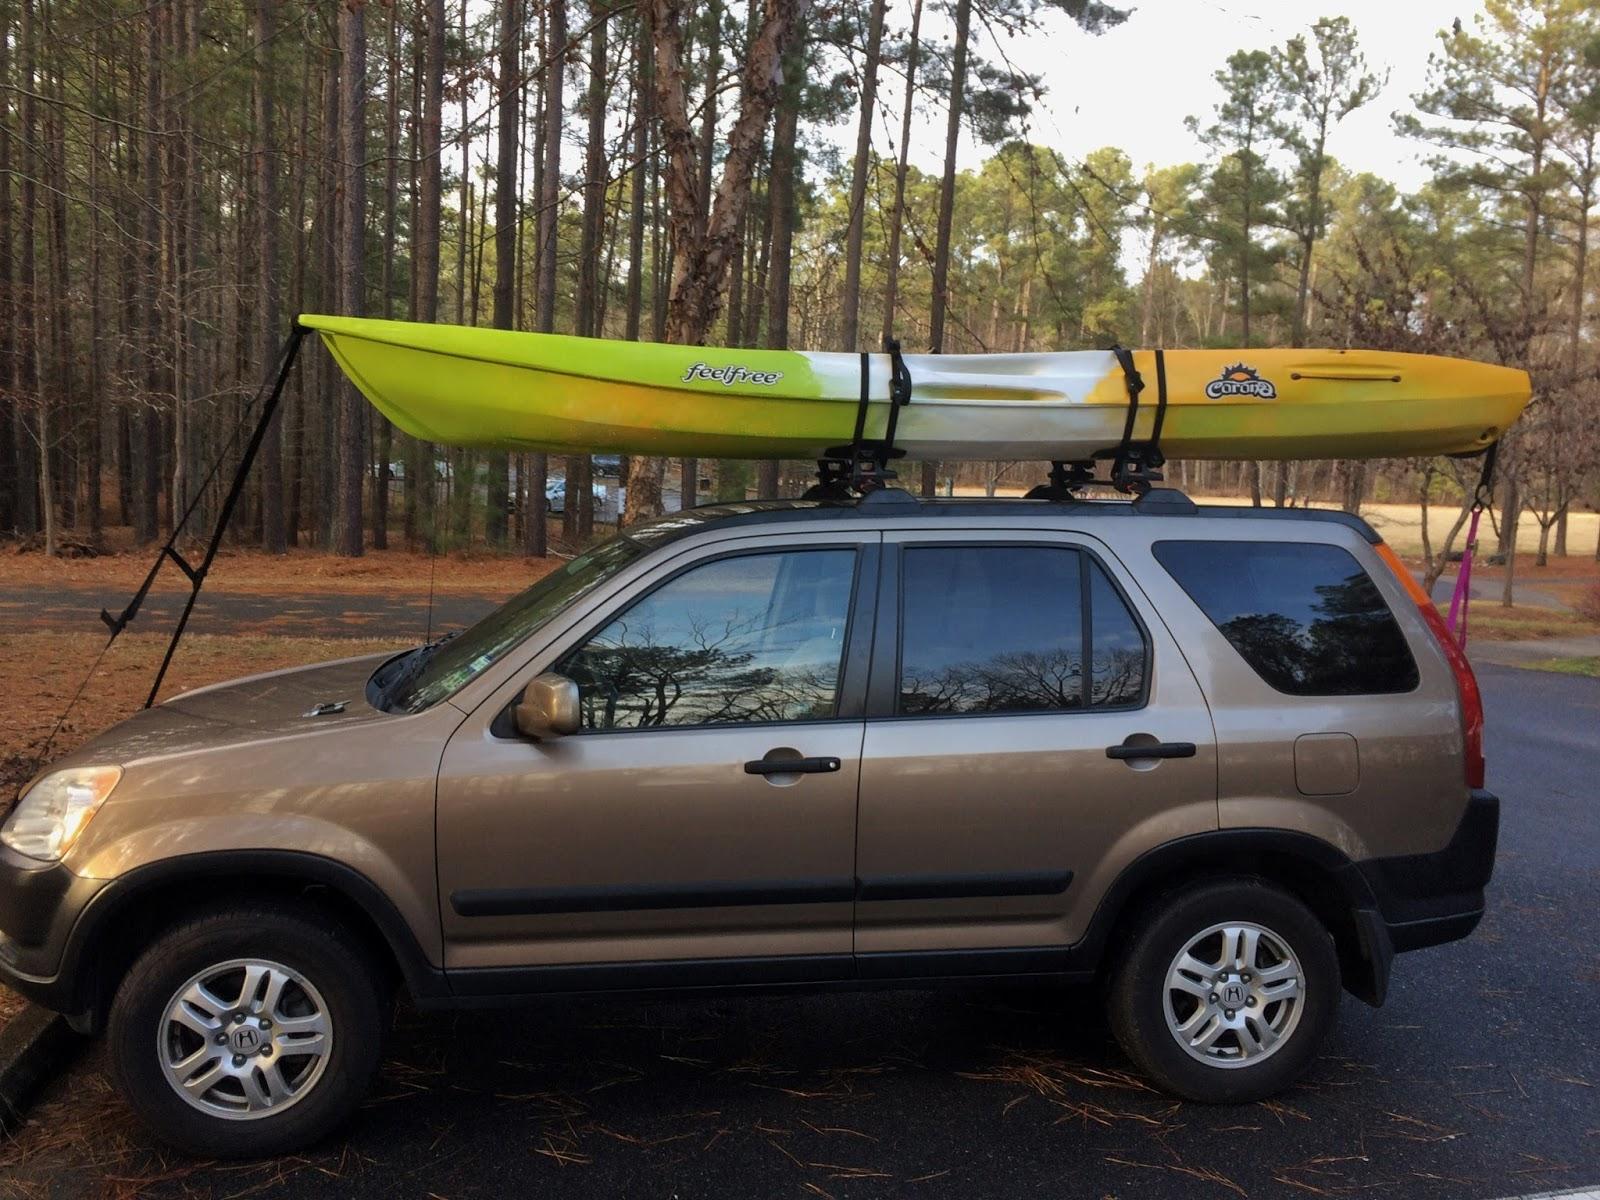 Of Yak Bondage Strapping Down Your Kayak